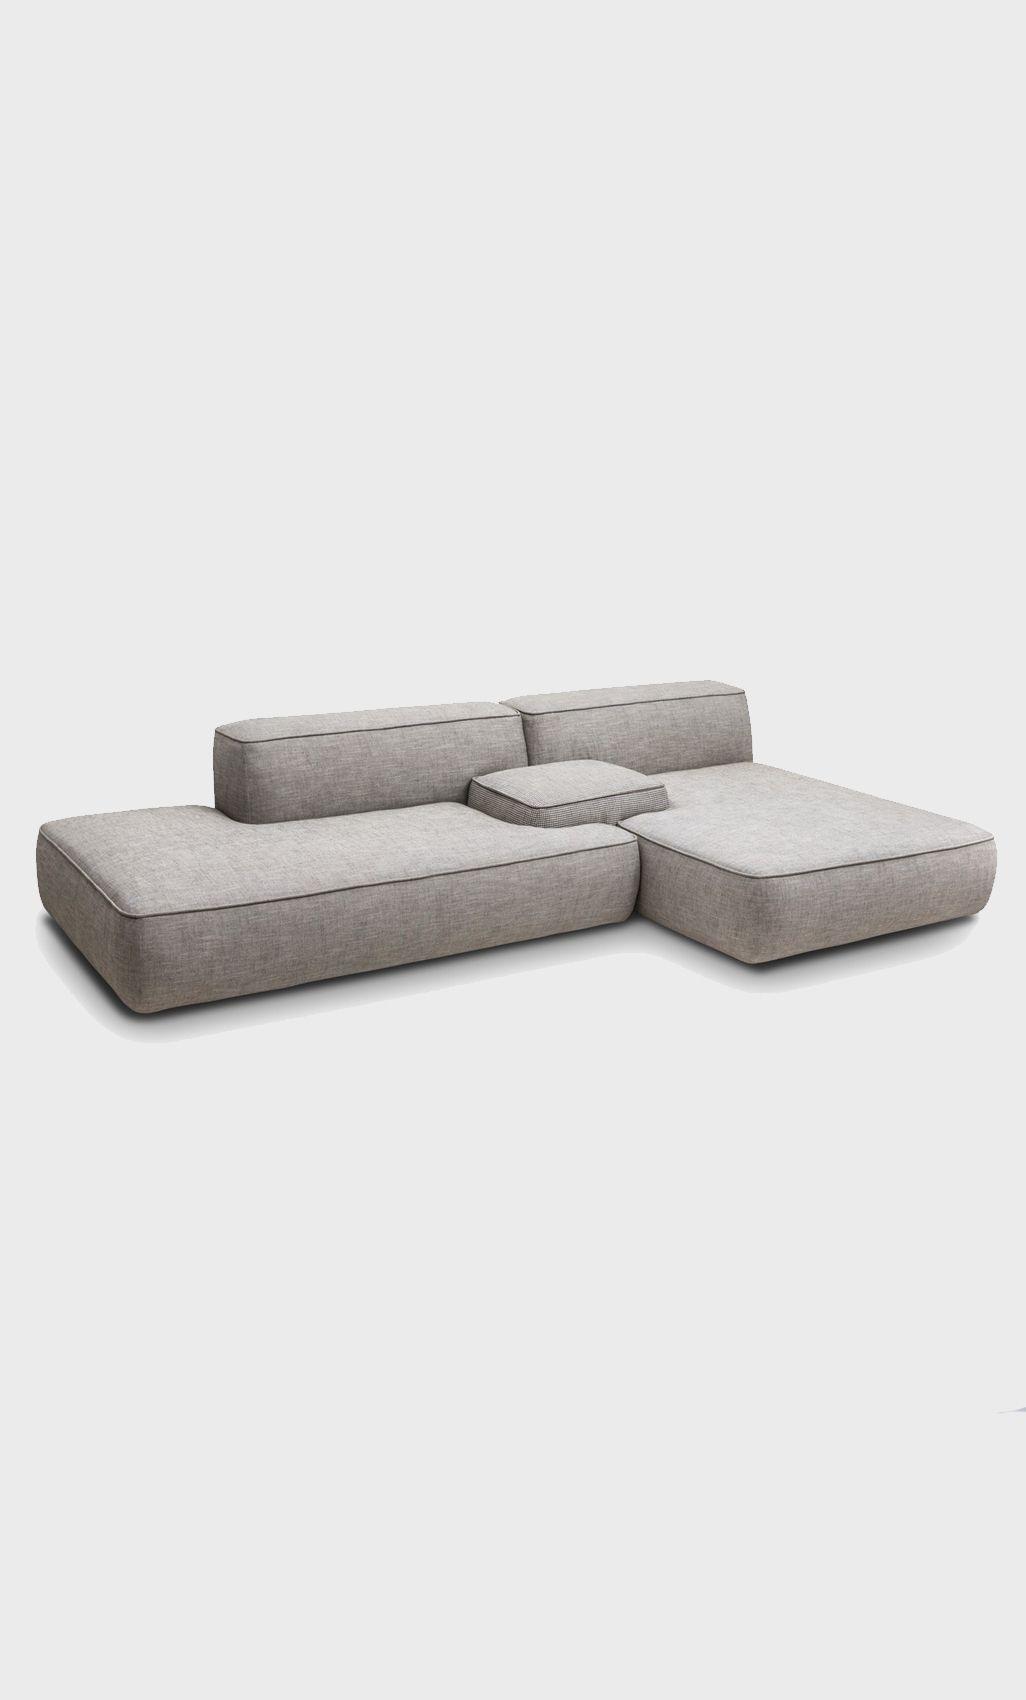 sofasandmore chesterfield vs wigan sofascore modular sofa no legs or really small low i sofas